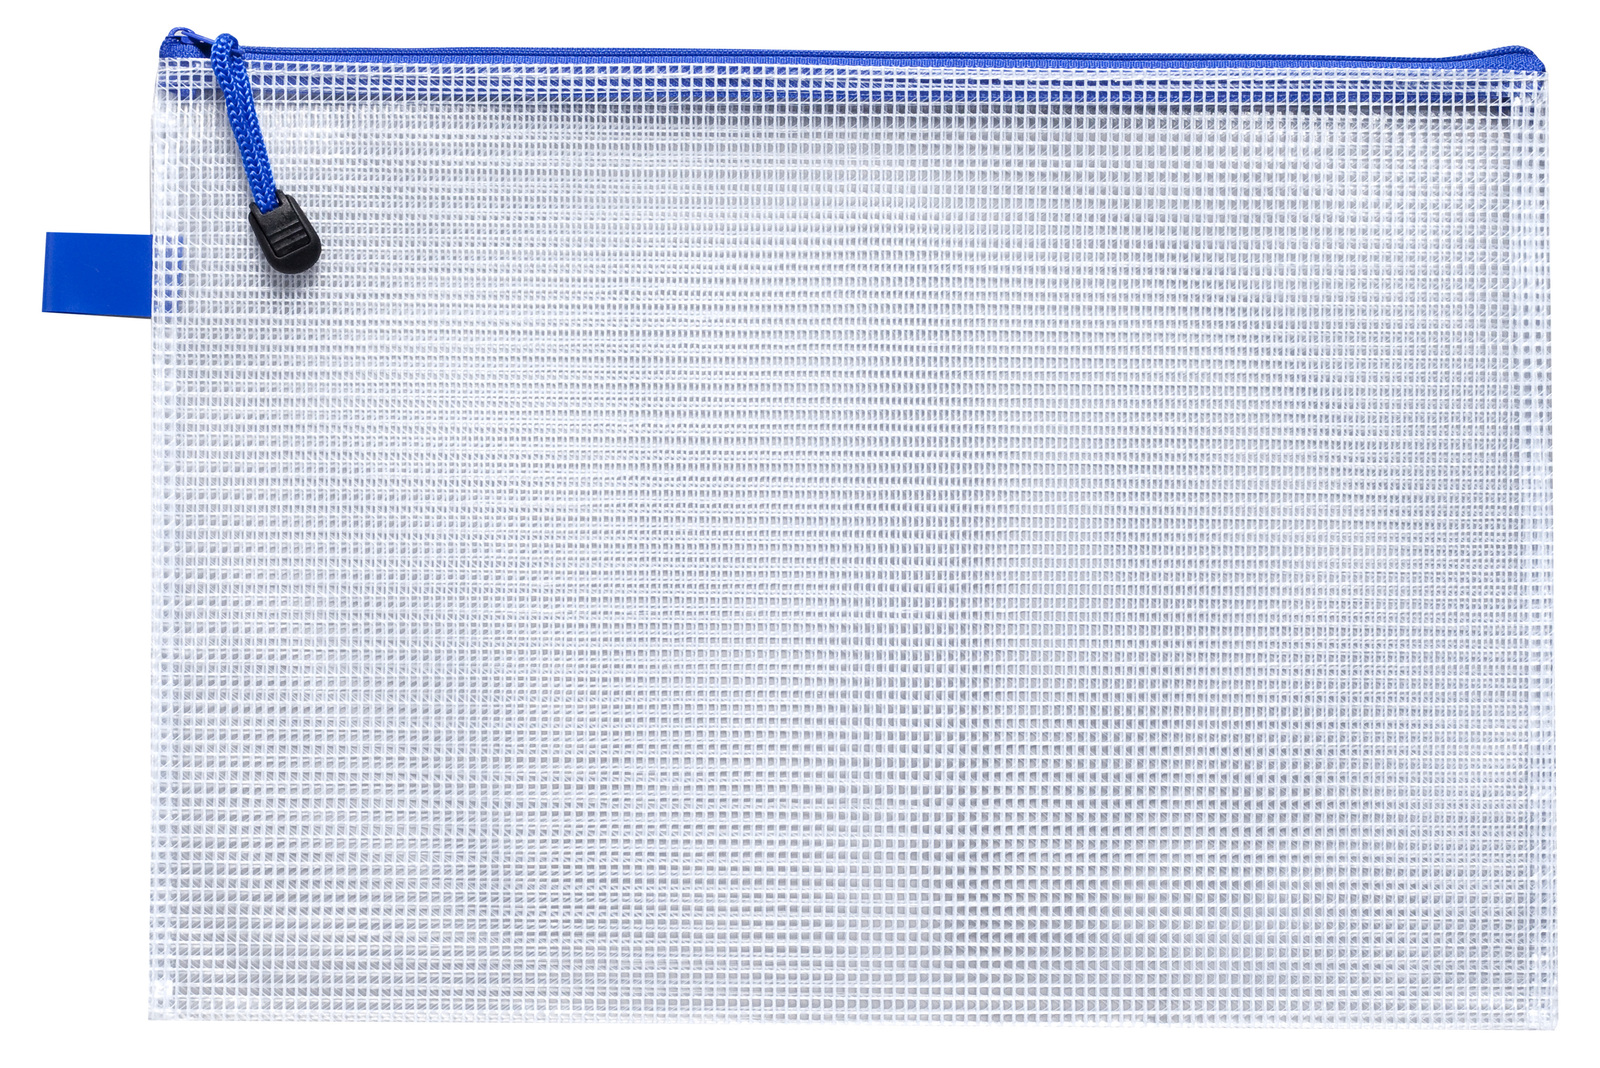 Mesh Bag - A4 Oversize (345 x 240) image